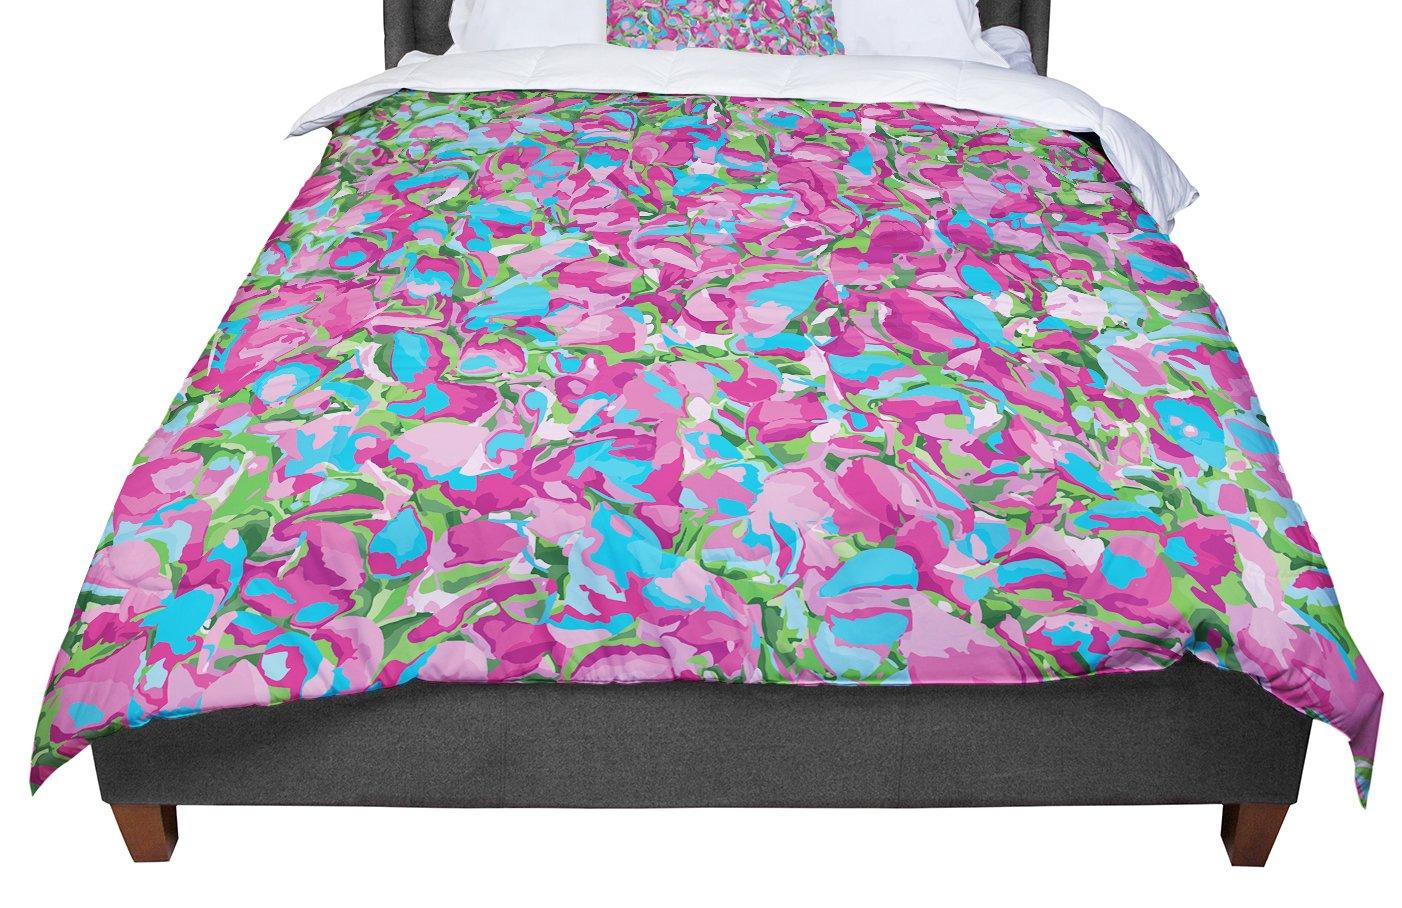 KESS InHouse Empire Ruhl Abstract Spring Petals Pink Blue King Cal King Comforter 104 X 88